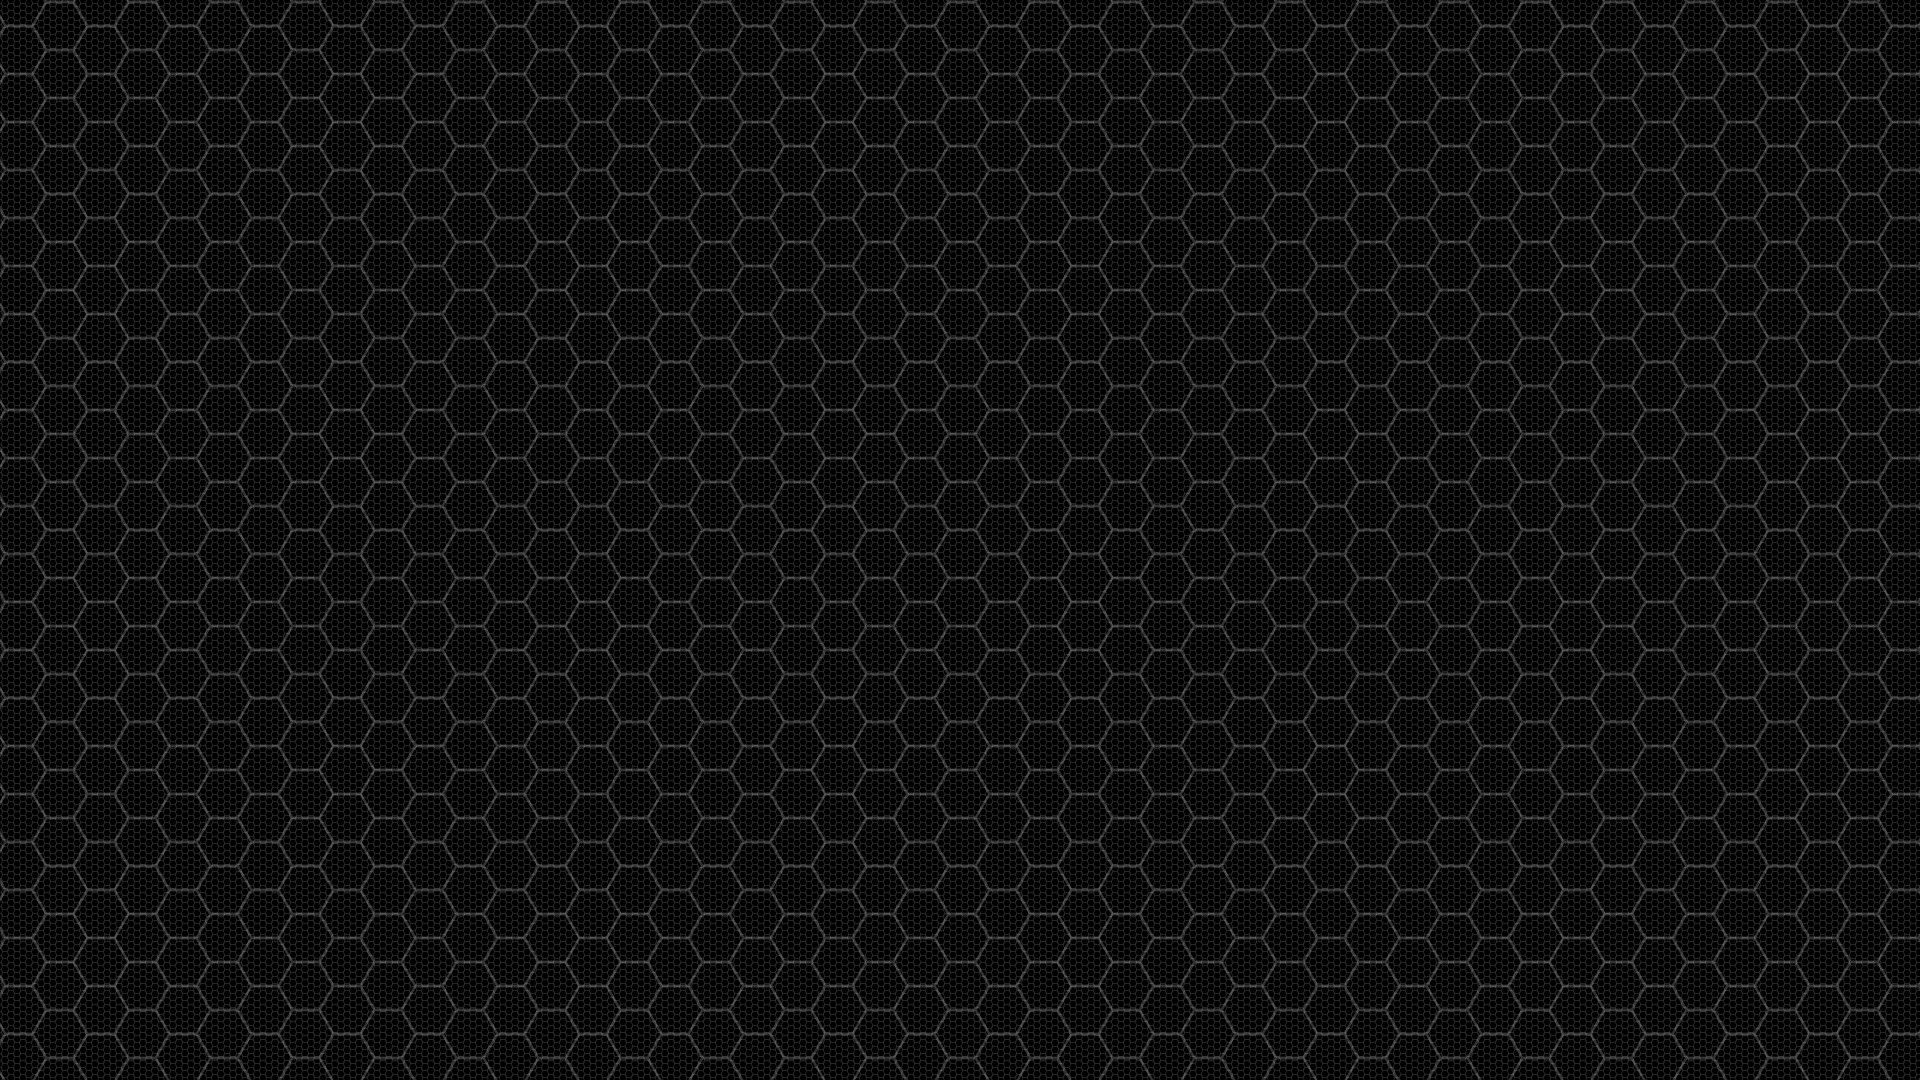 carbon fiber background 1920x1080